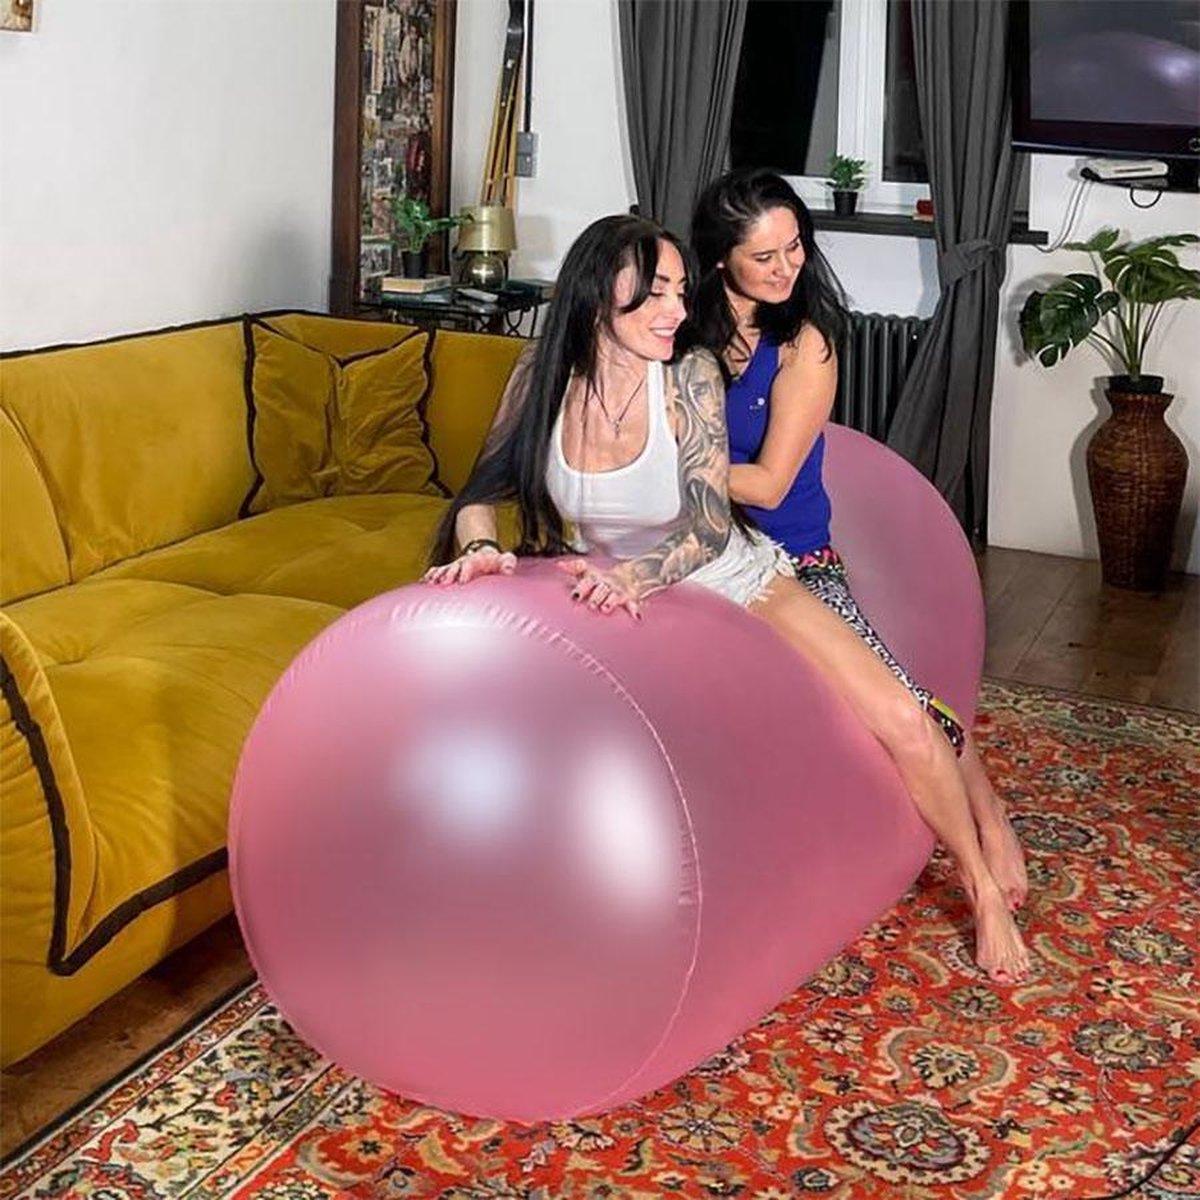 Opblaasbaar rond kussen 2 meter lang/ 70 cm hoog - kleur Roze